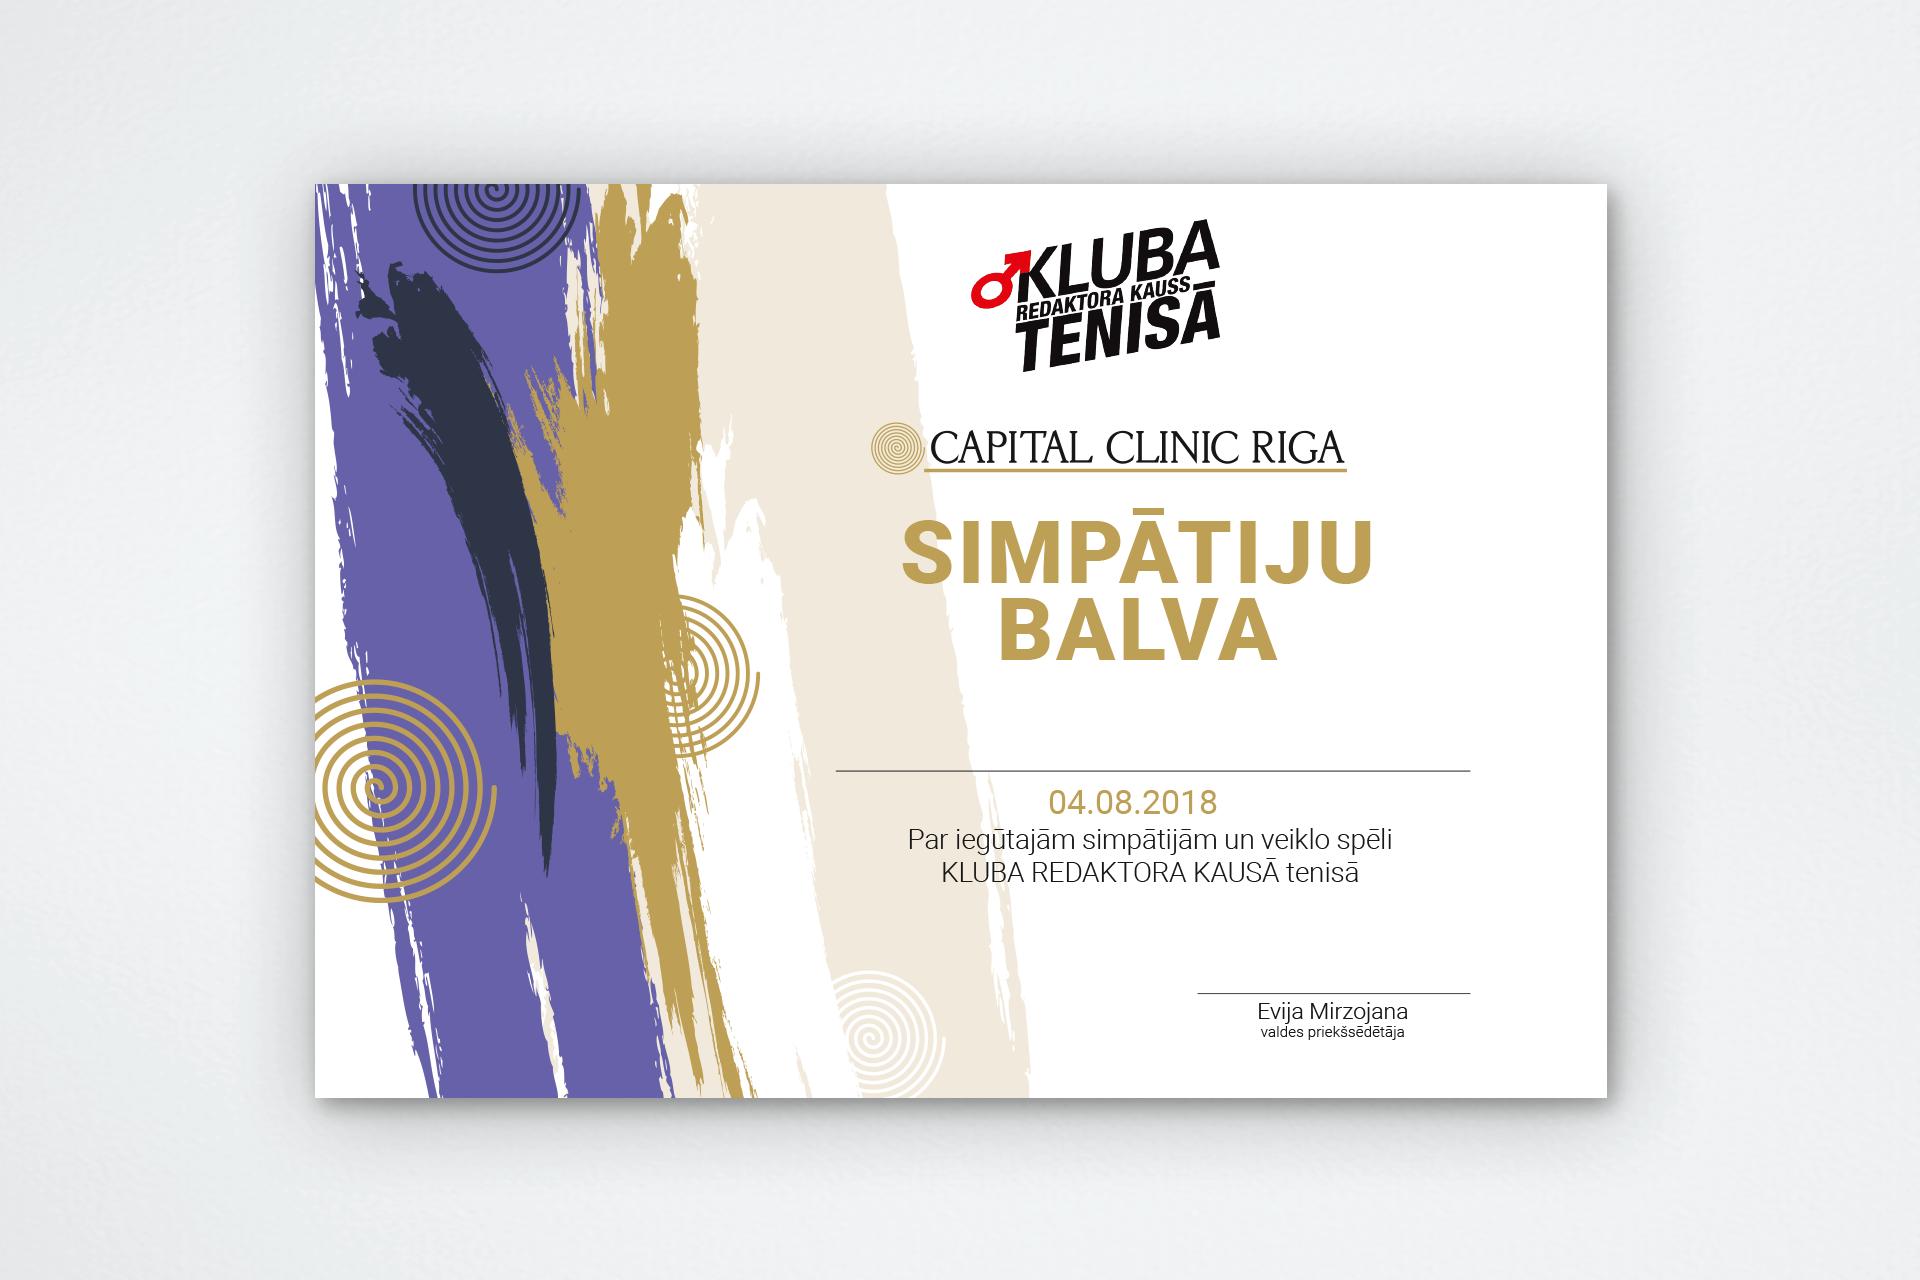 CCR+Klubs_simpatiju-balava_diploms_1920x1280